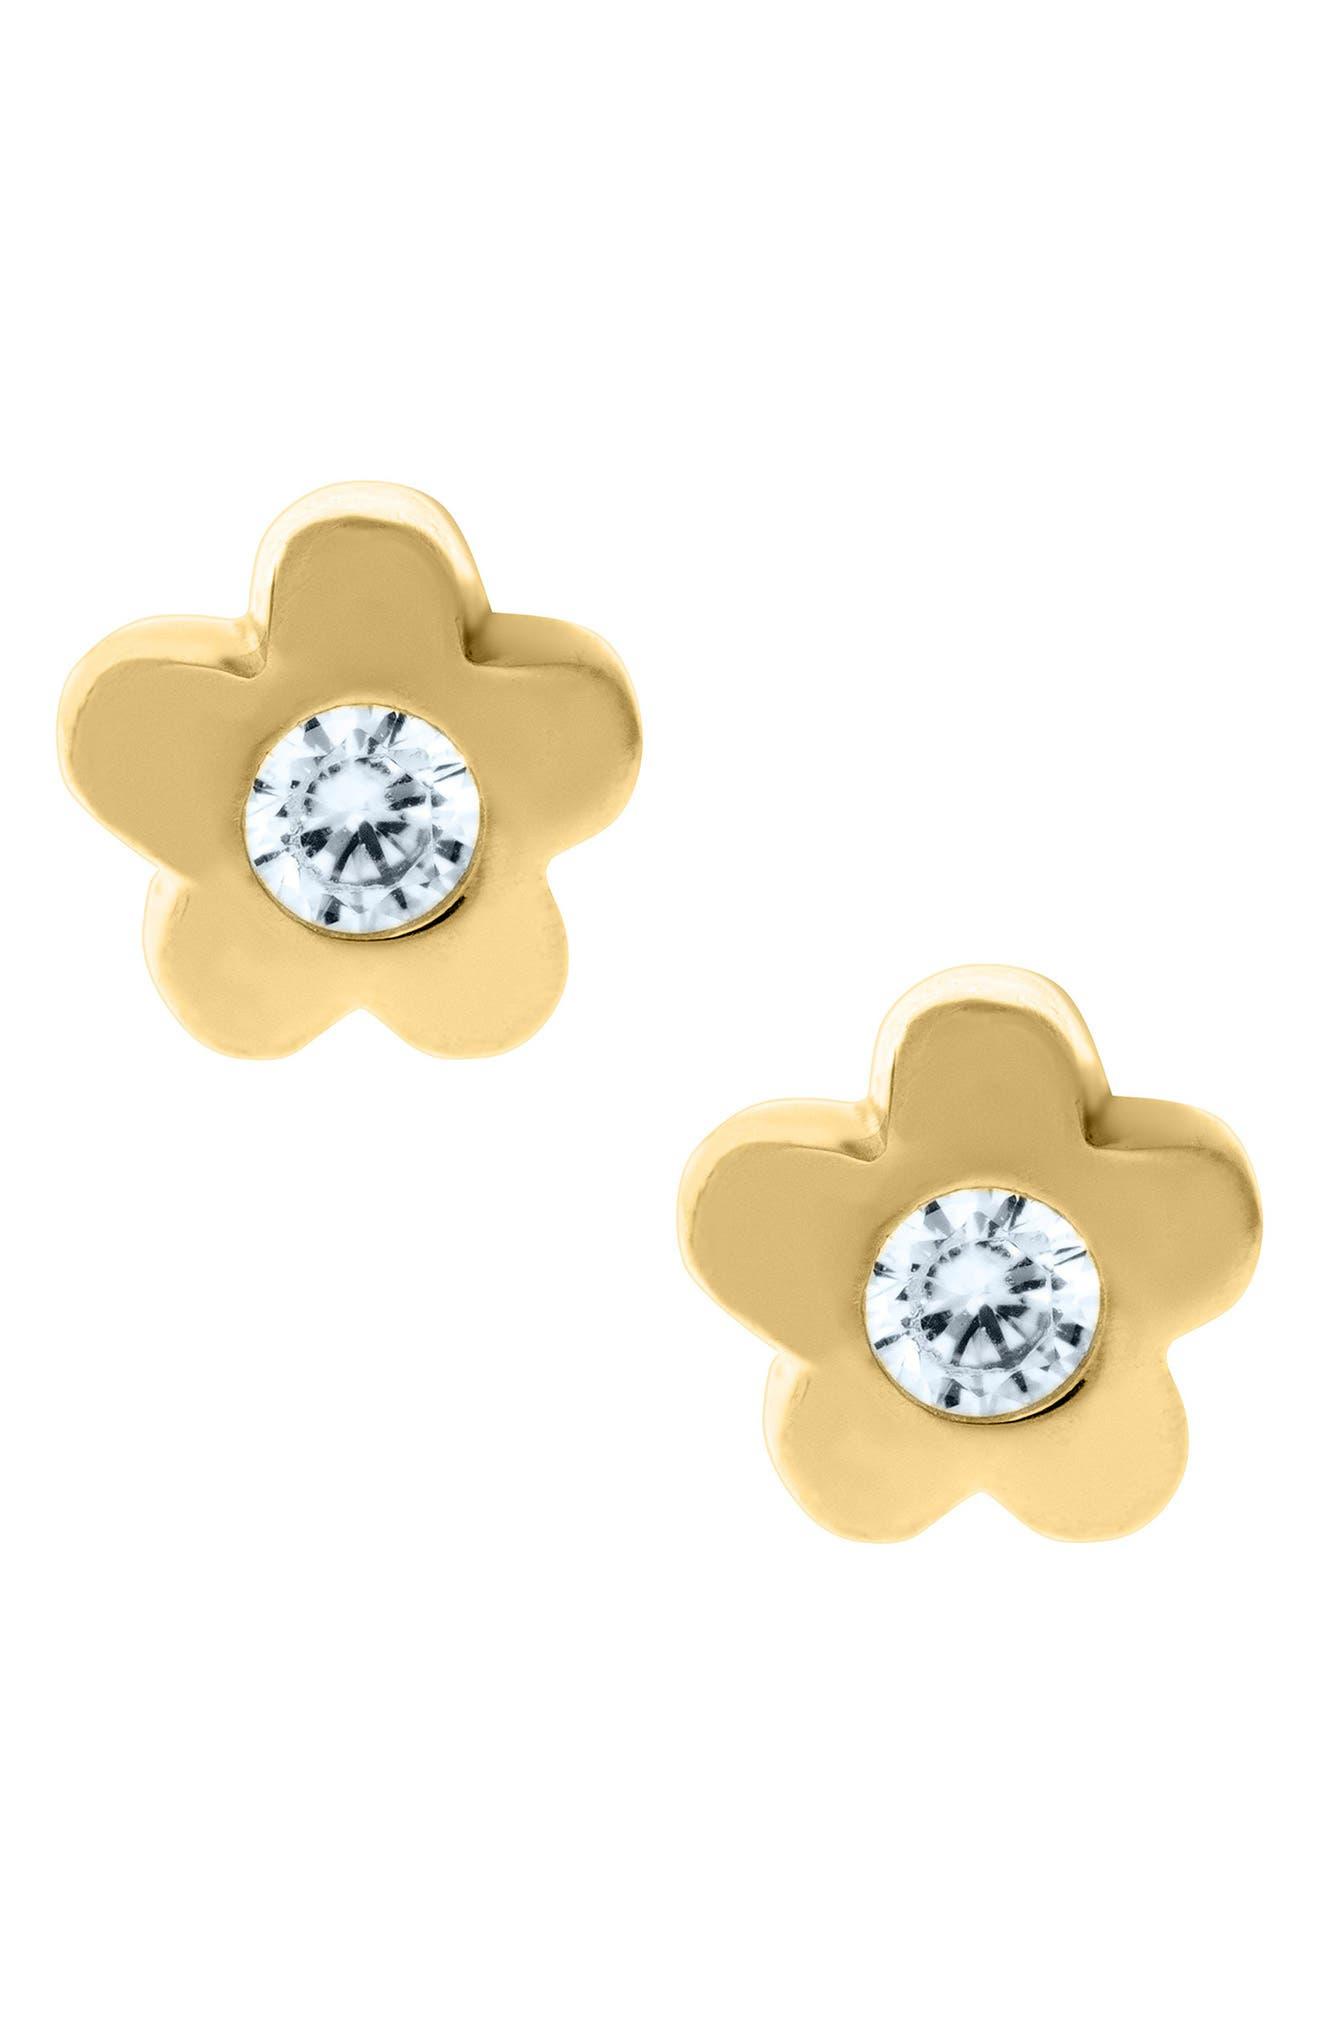 14k Gold & Cubic Zirconia Flower Earrings,                             Main thumbnail 1, color,                             Gold